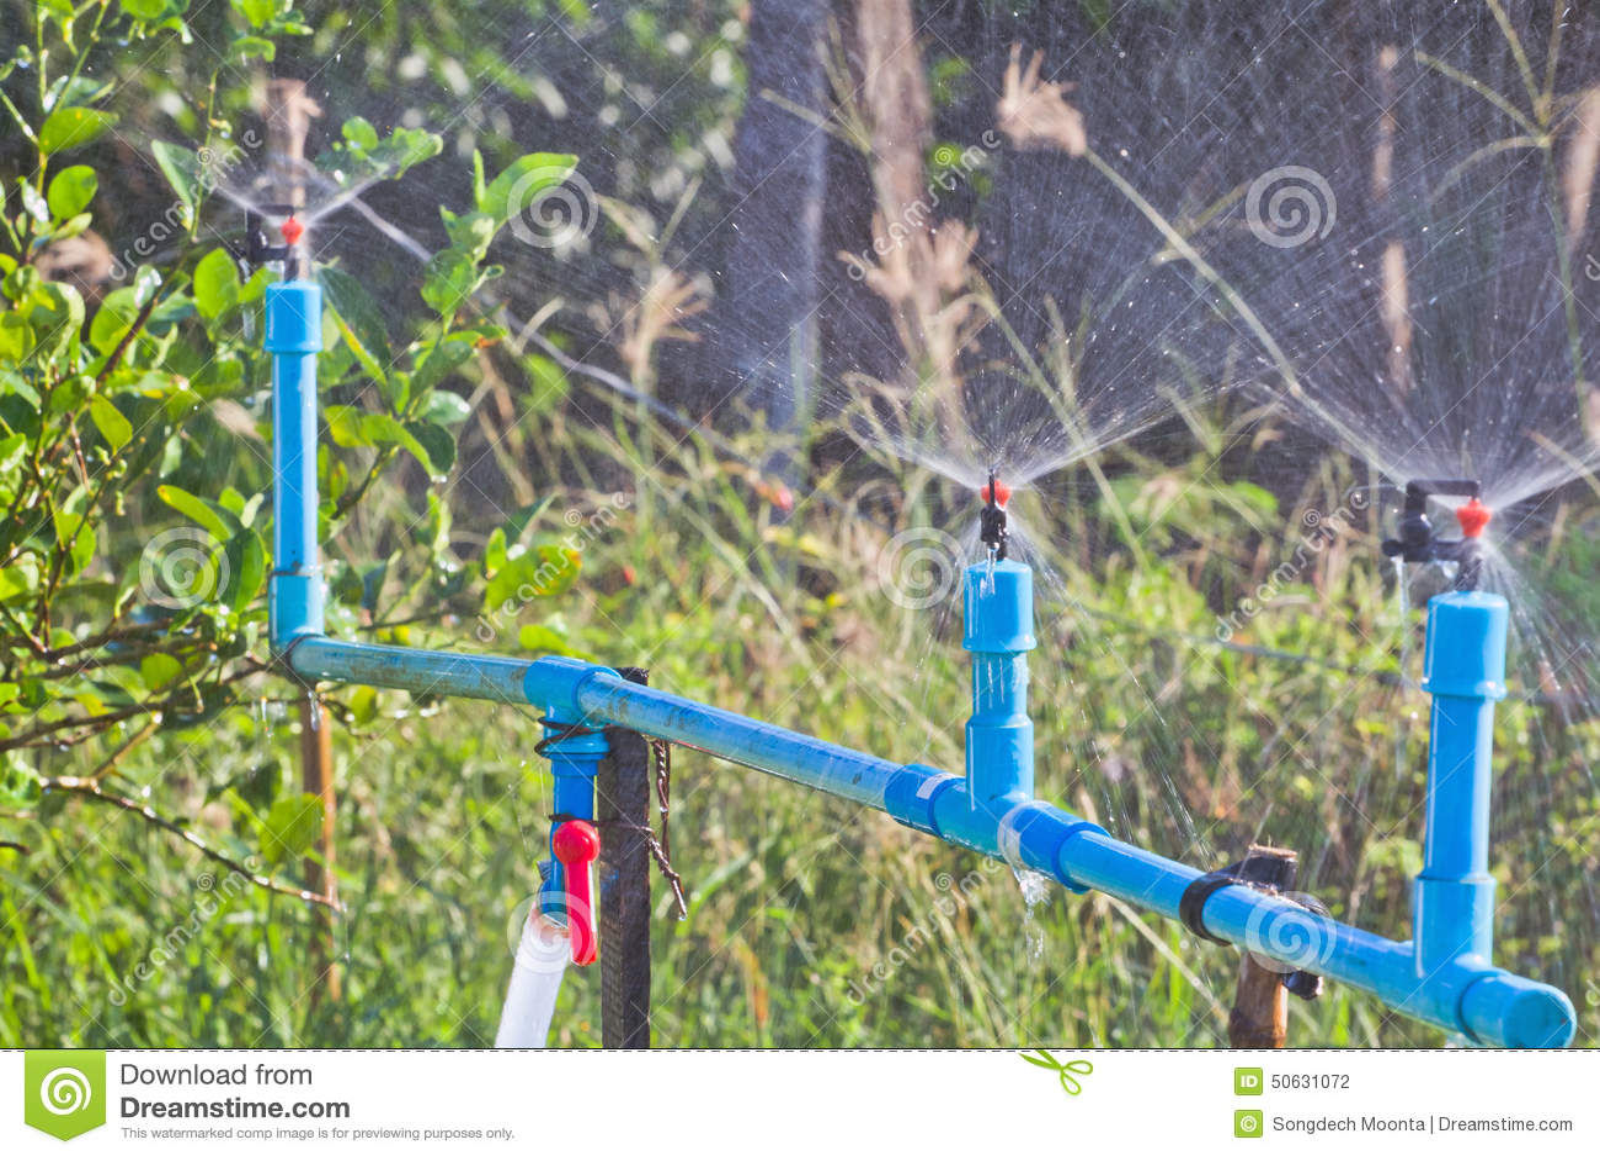 Garden Irrigation Stock Photo. Image Of Healthy Irrigation - 50631072